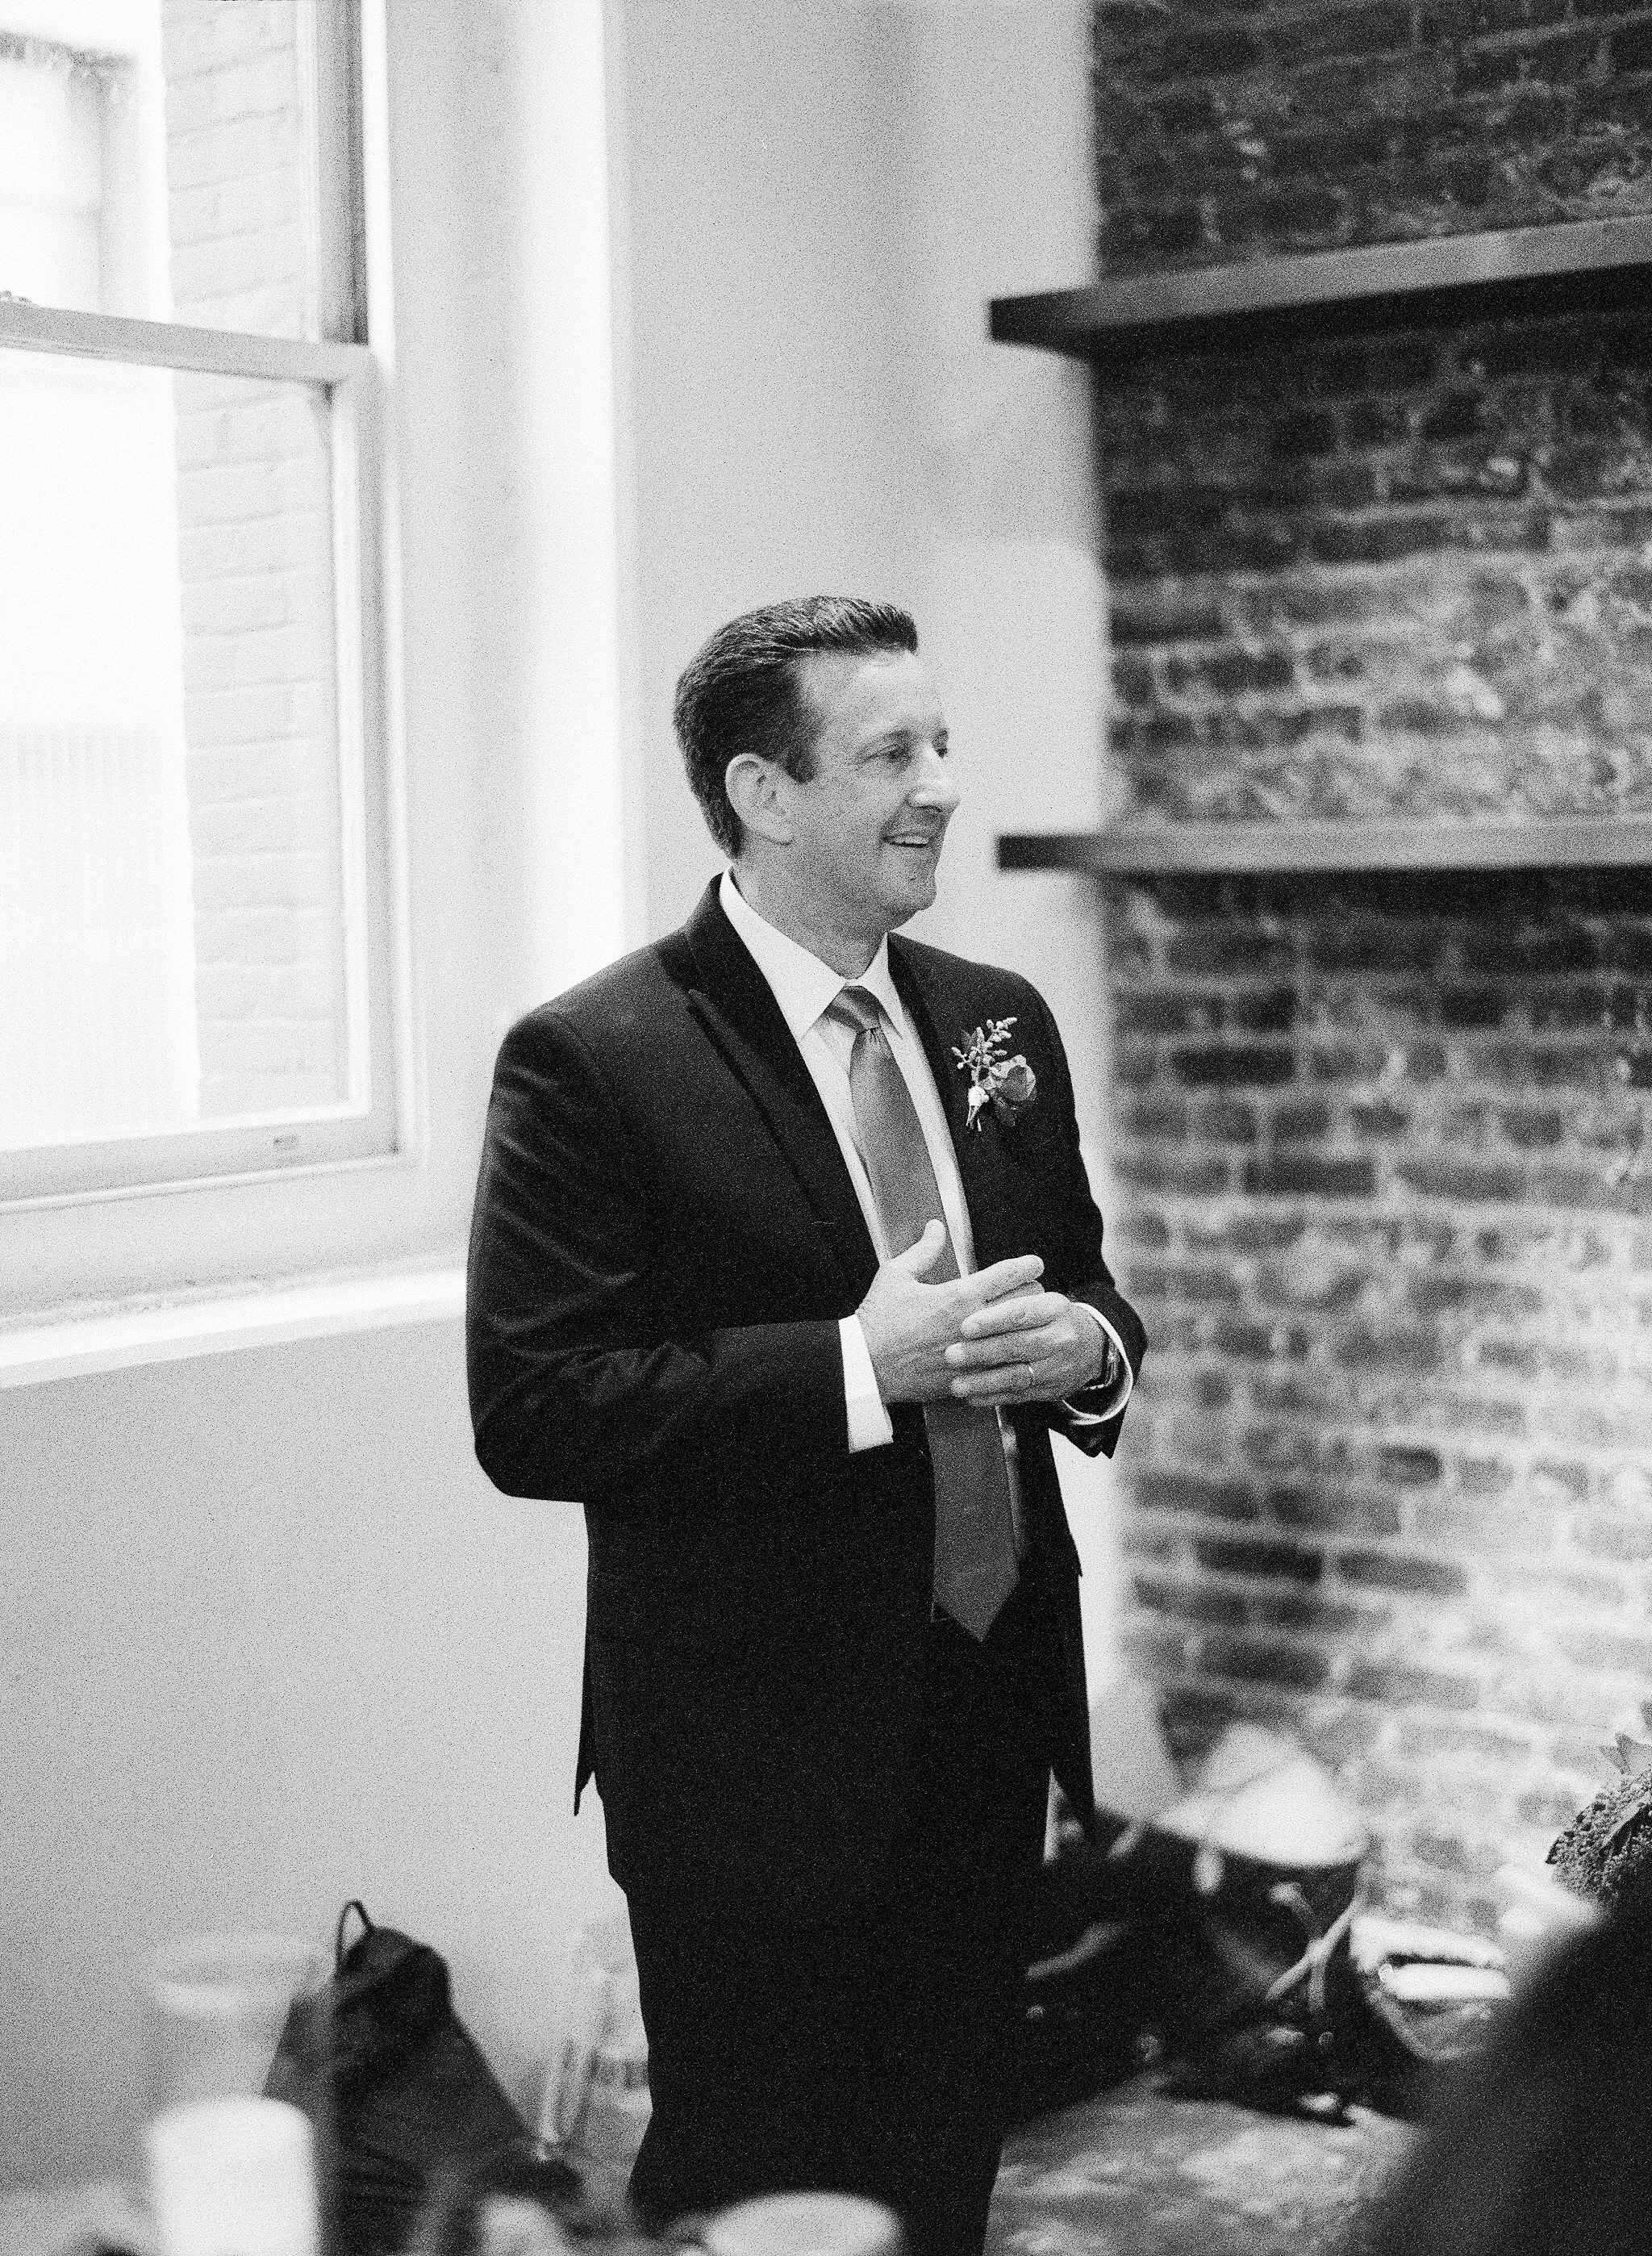 Meghan Mehan Photography - California Wedding Photographer | San Francisco City Hall Wedding 159.jpg